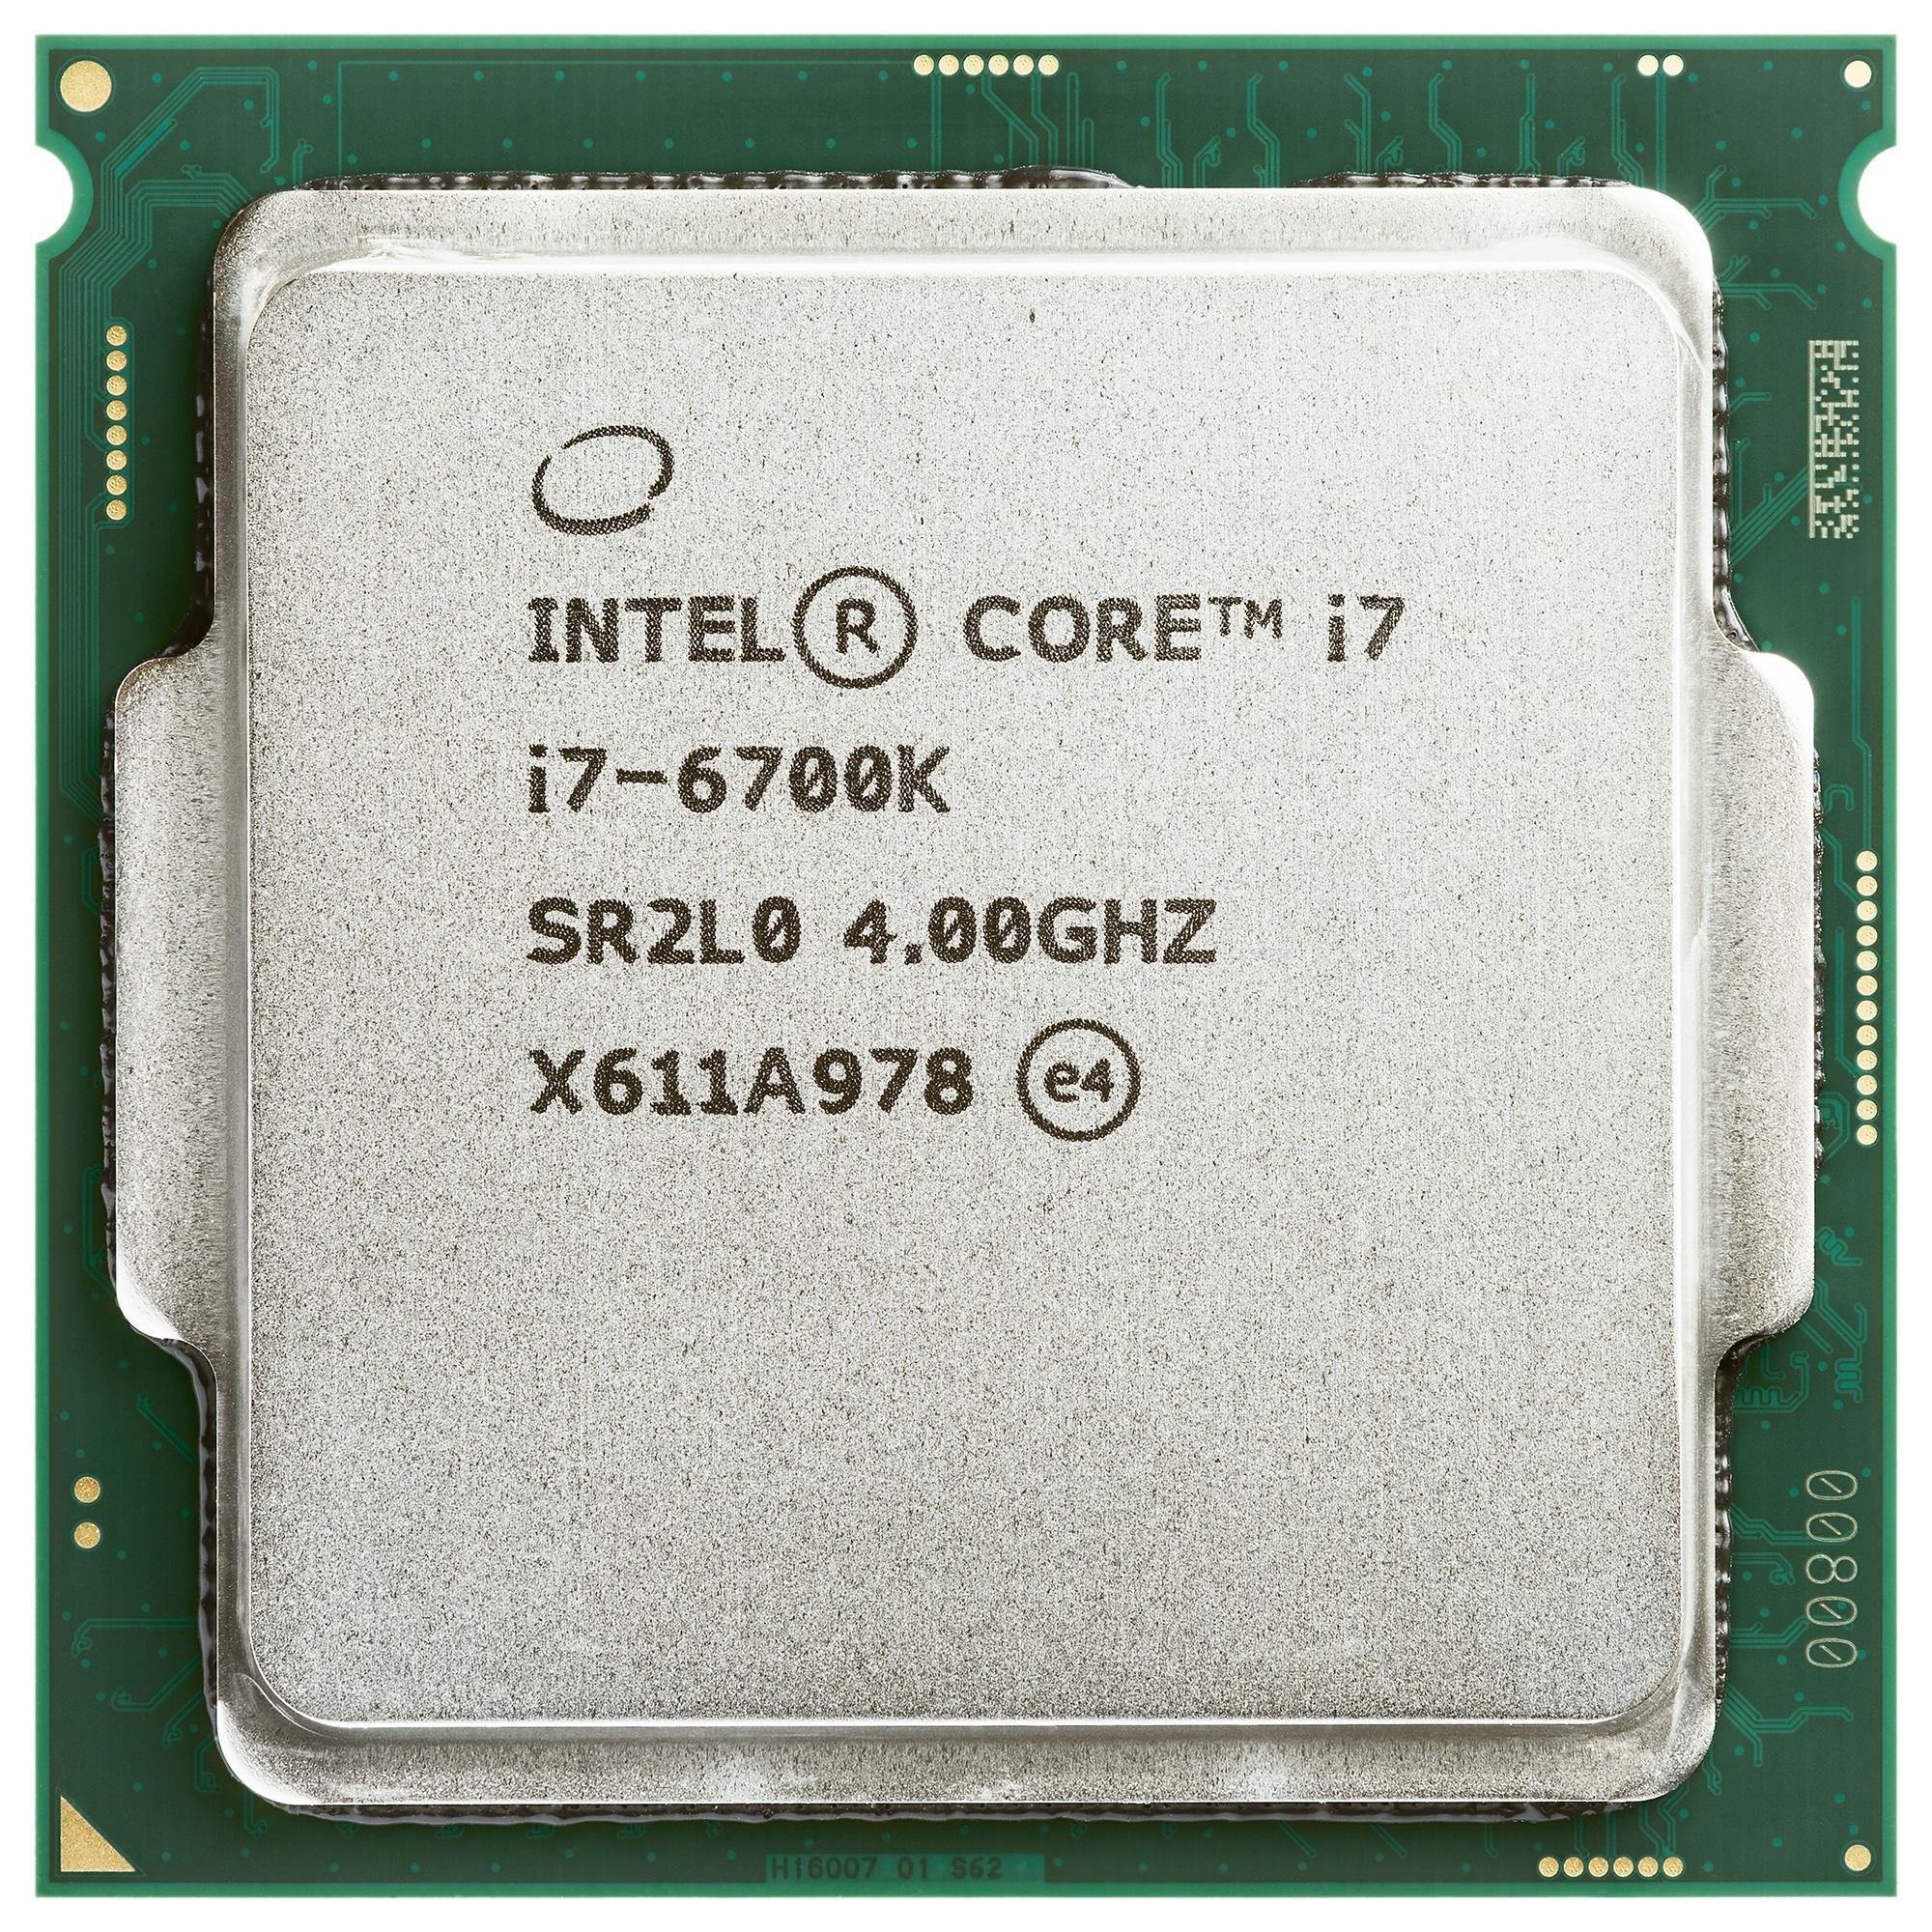 Fileintel Cpu Core I7 6700k Skylake Top Wikimedia Commons Intelcomputers History Intel Computers Integrated Circuit